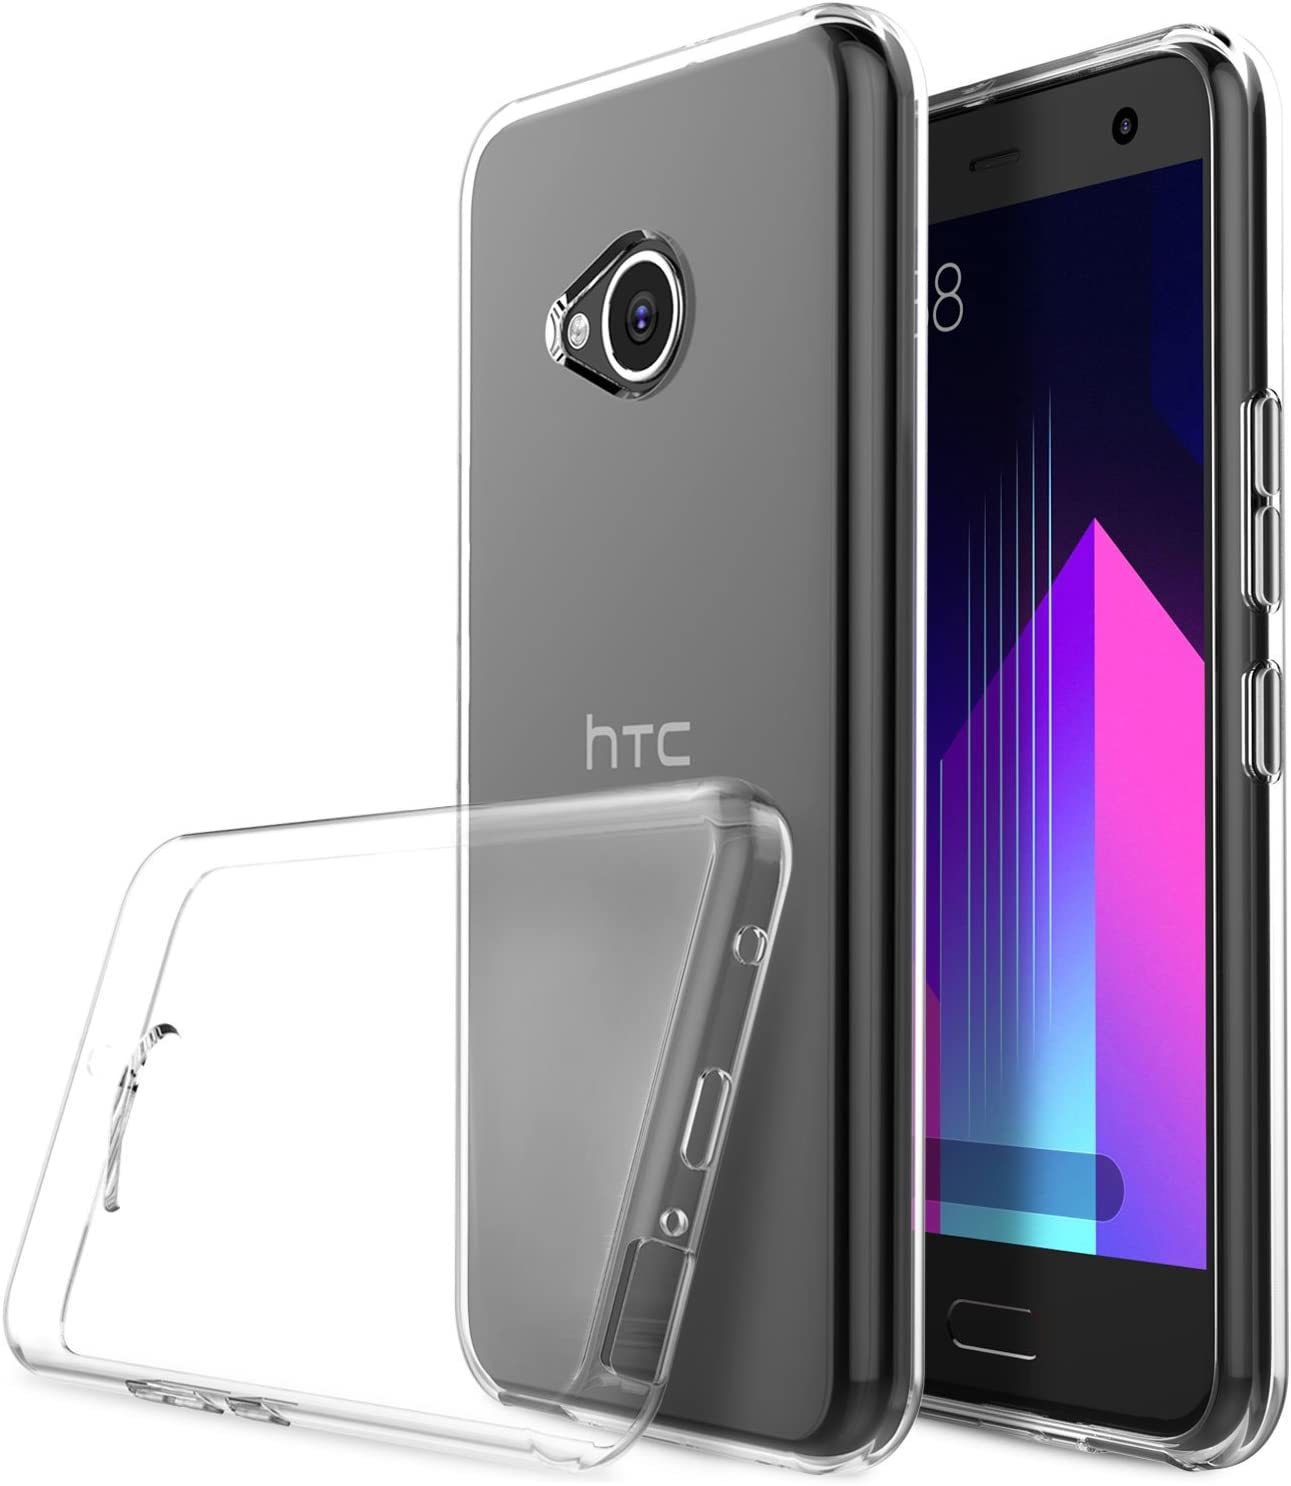 Funda HTC U11 Life, KuGi TPU Transparente Slim Silicona Case Cover [Anti-arañazos] para HTC U11 Life: Amazon.es: Electrónica